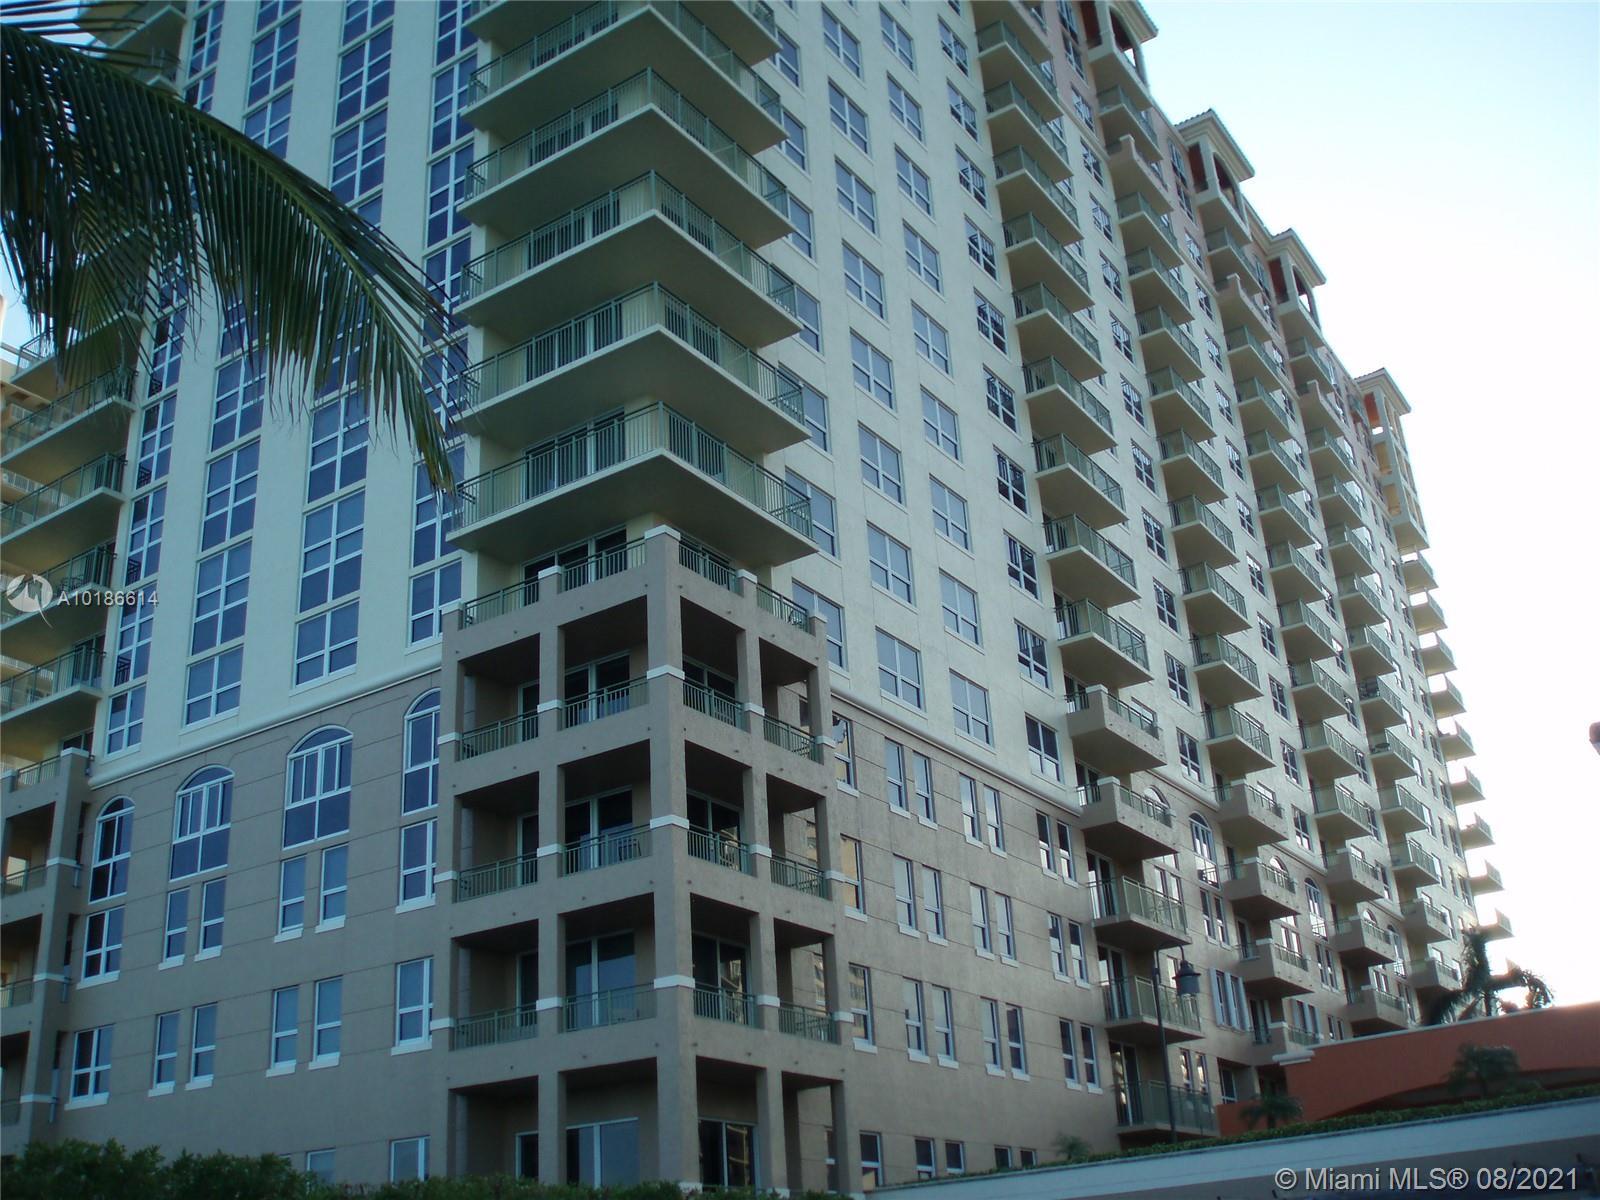 2080 Hallandale #609 - 2080 S Ocean Dr #609, Hallandale Beach, FL 33009